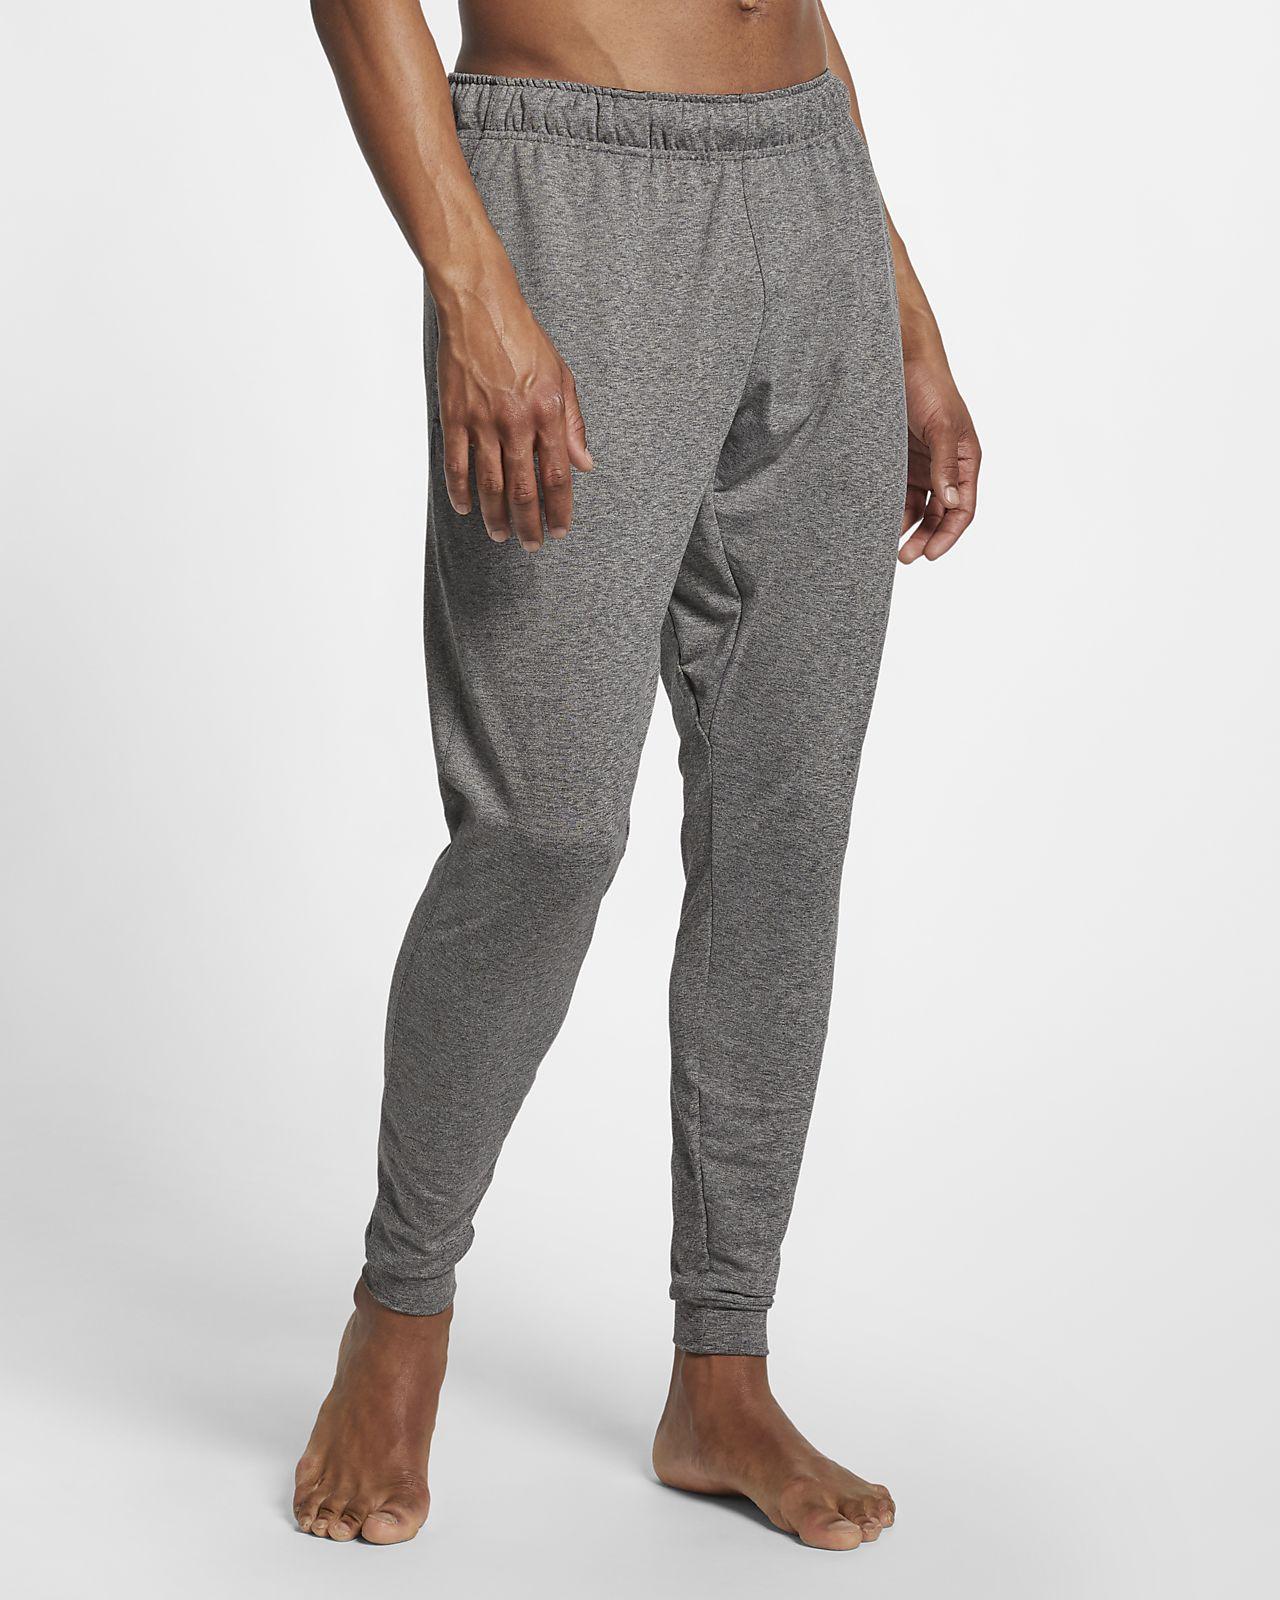 Yogabyxor Nike Dri-FIT för män